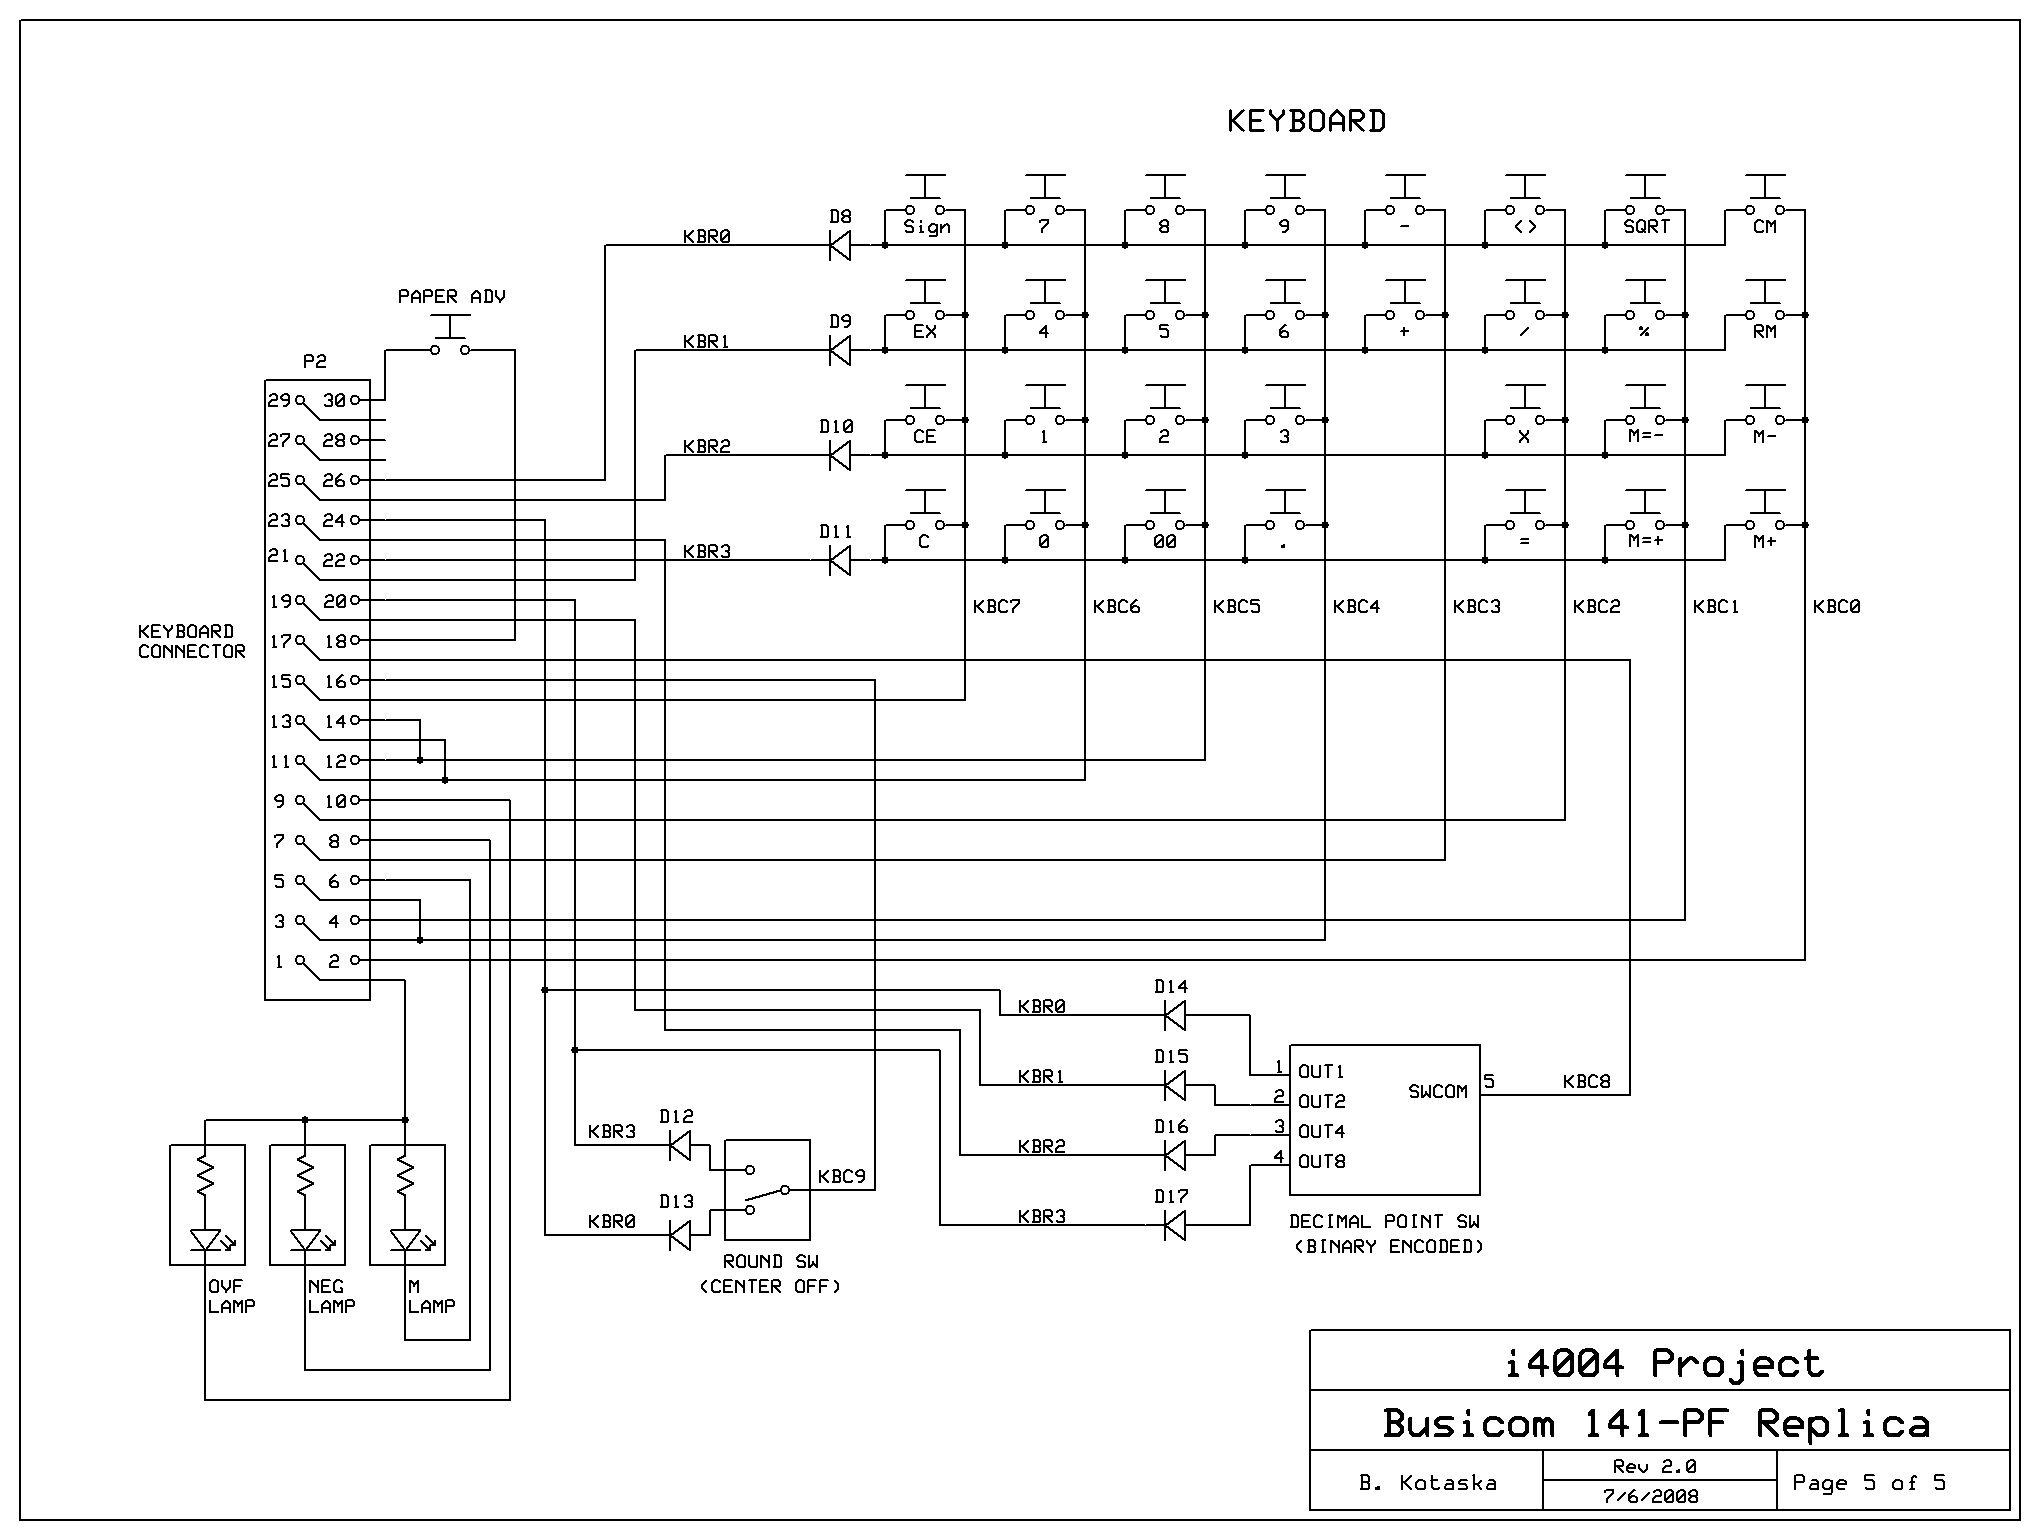 Bill Kotaska's schematic